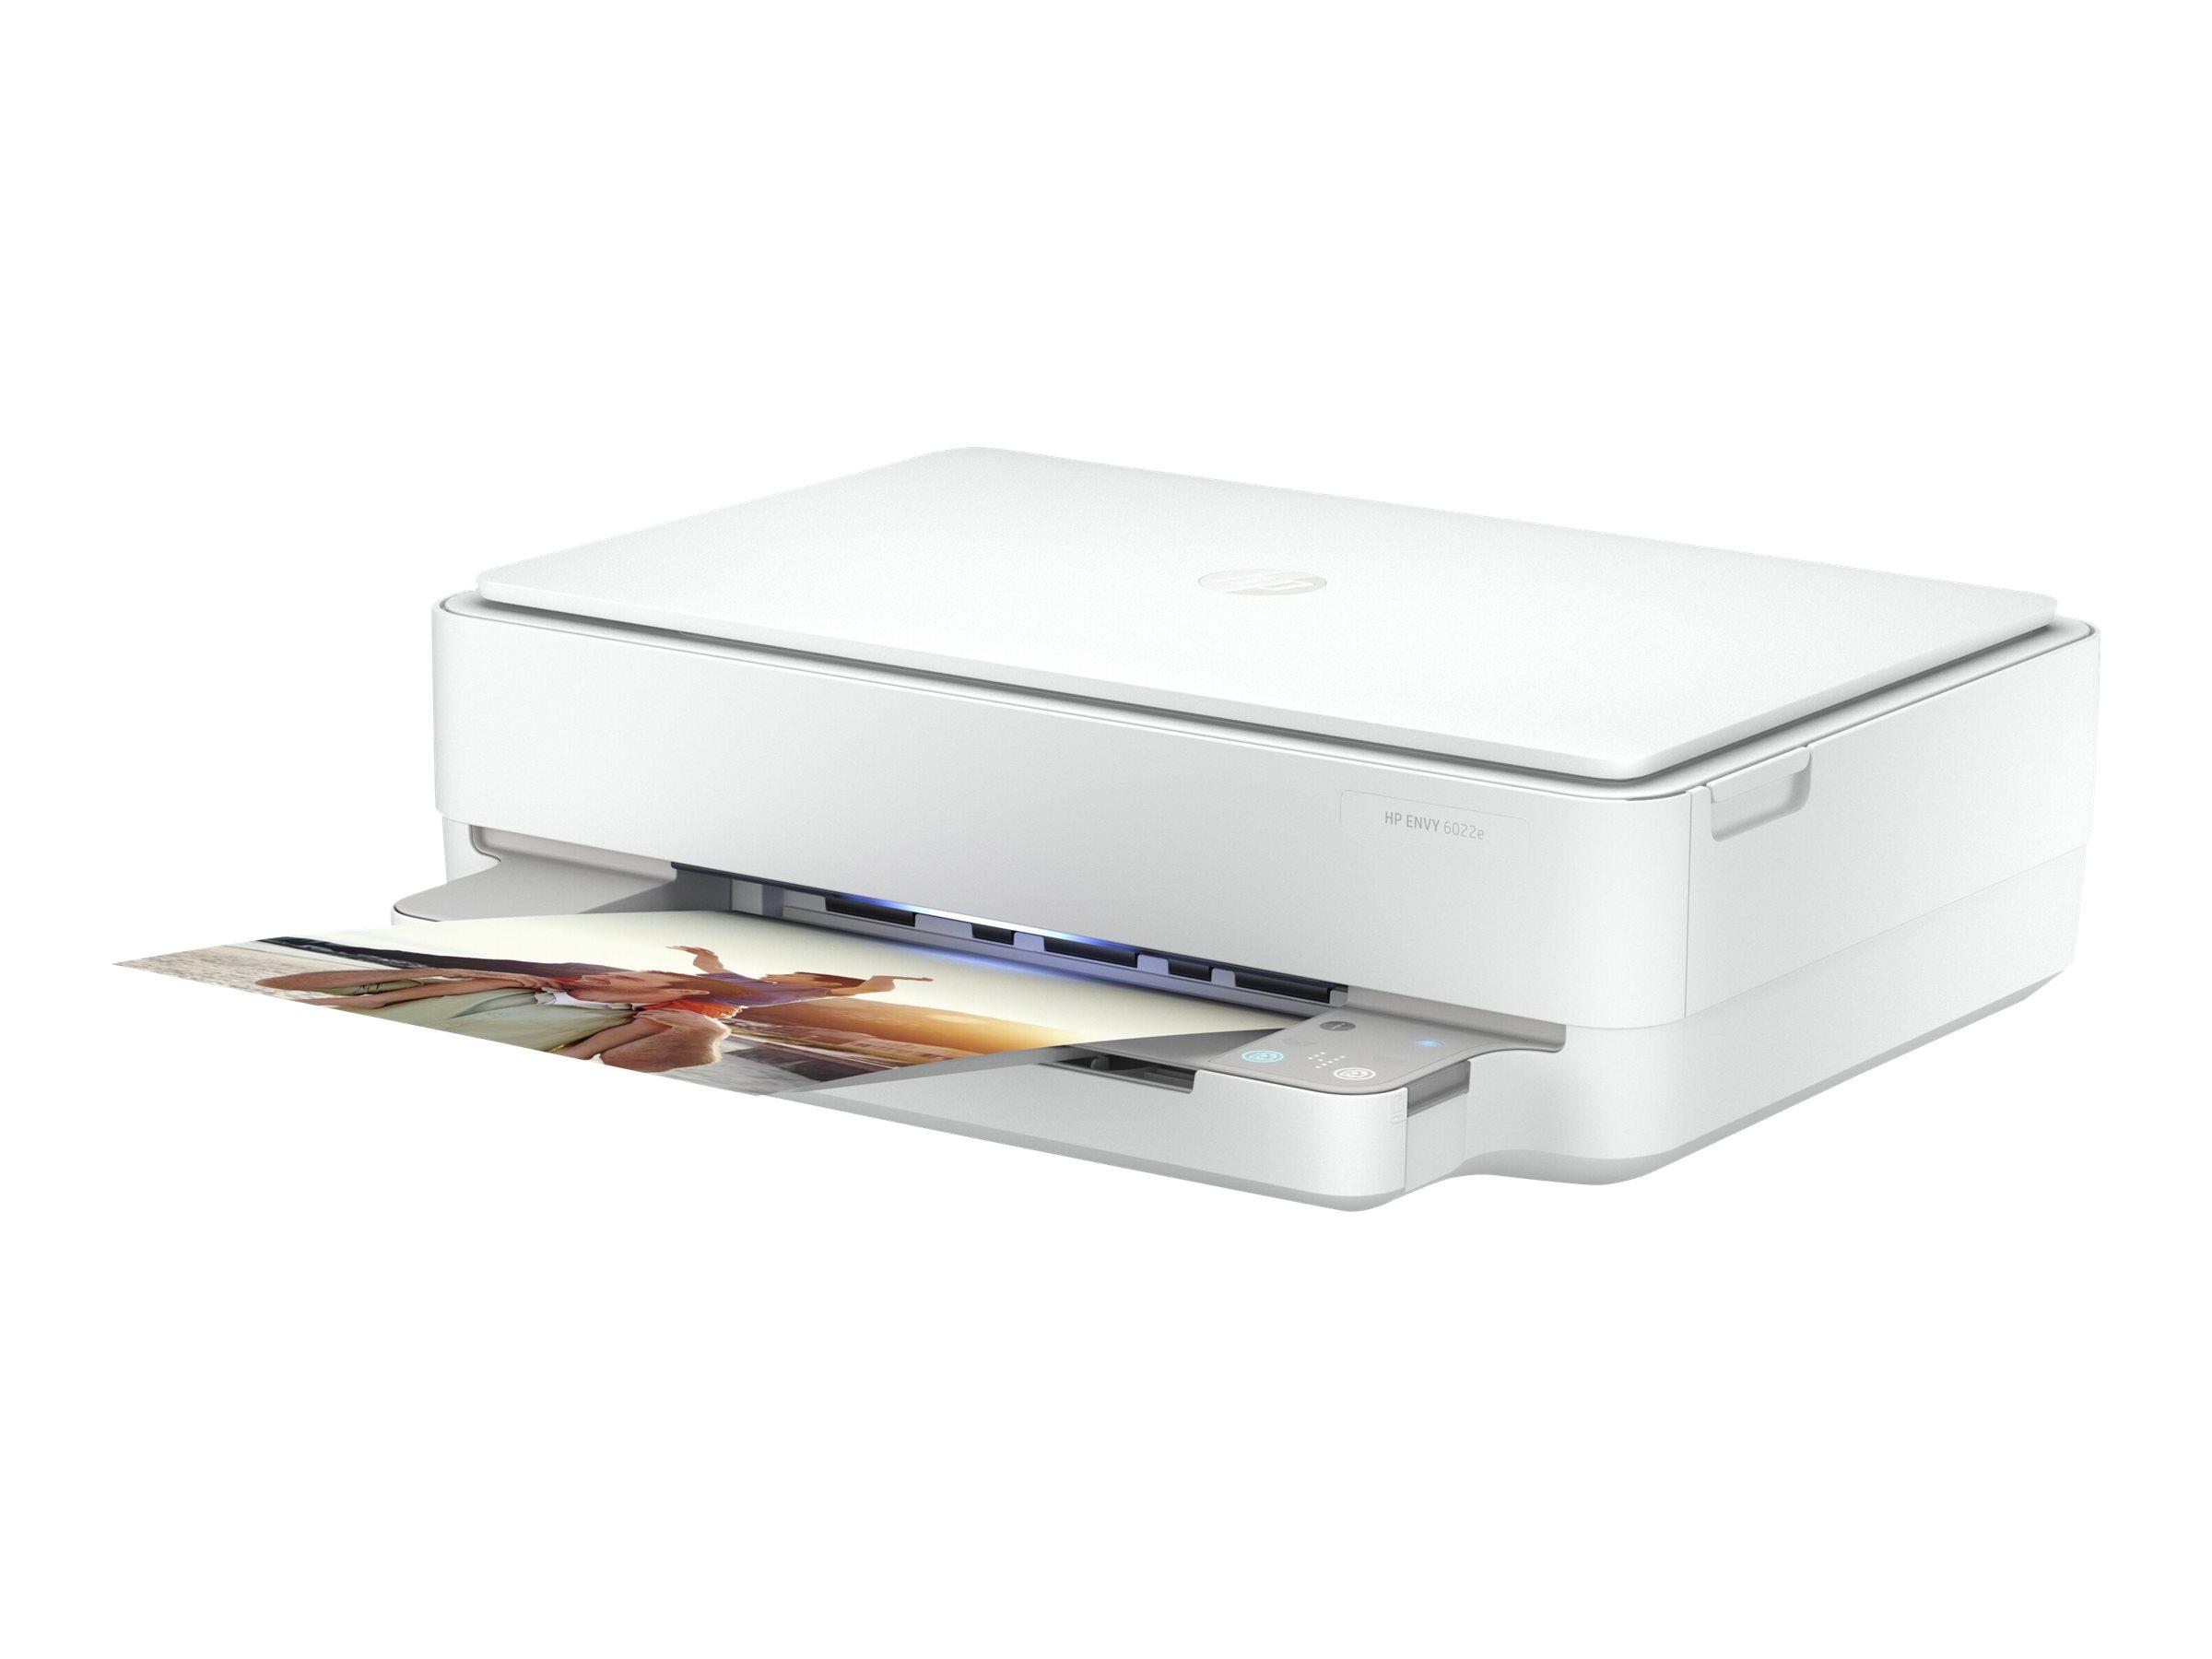 HP Envy 6022e All-in-One - Multifunktionsdrucker - Farbe - Tintenstrahl - 216 x 297 mm (Original)